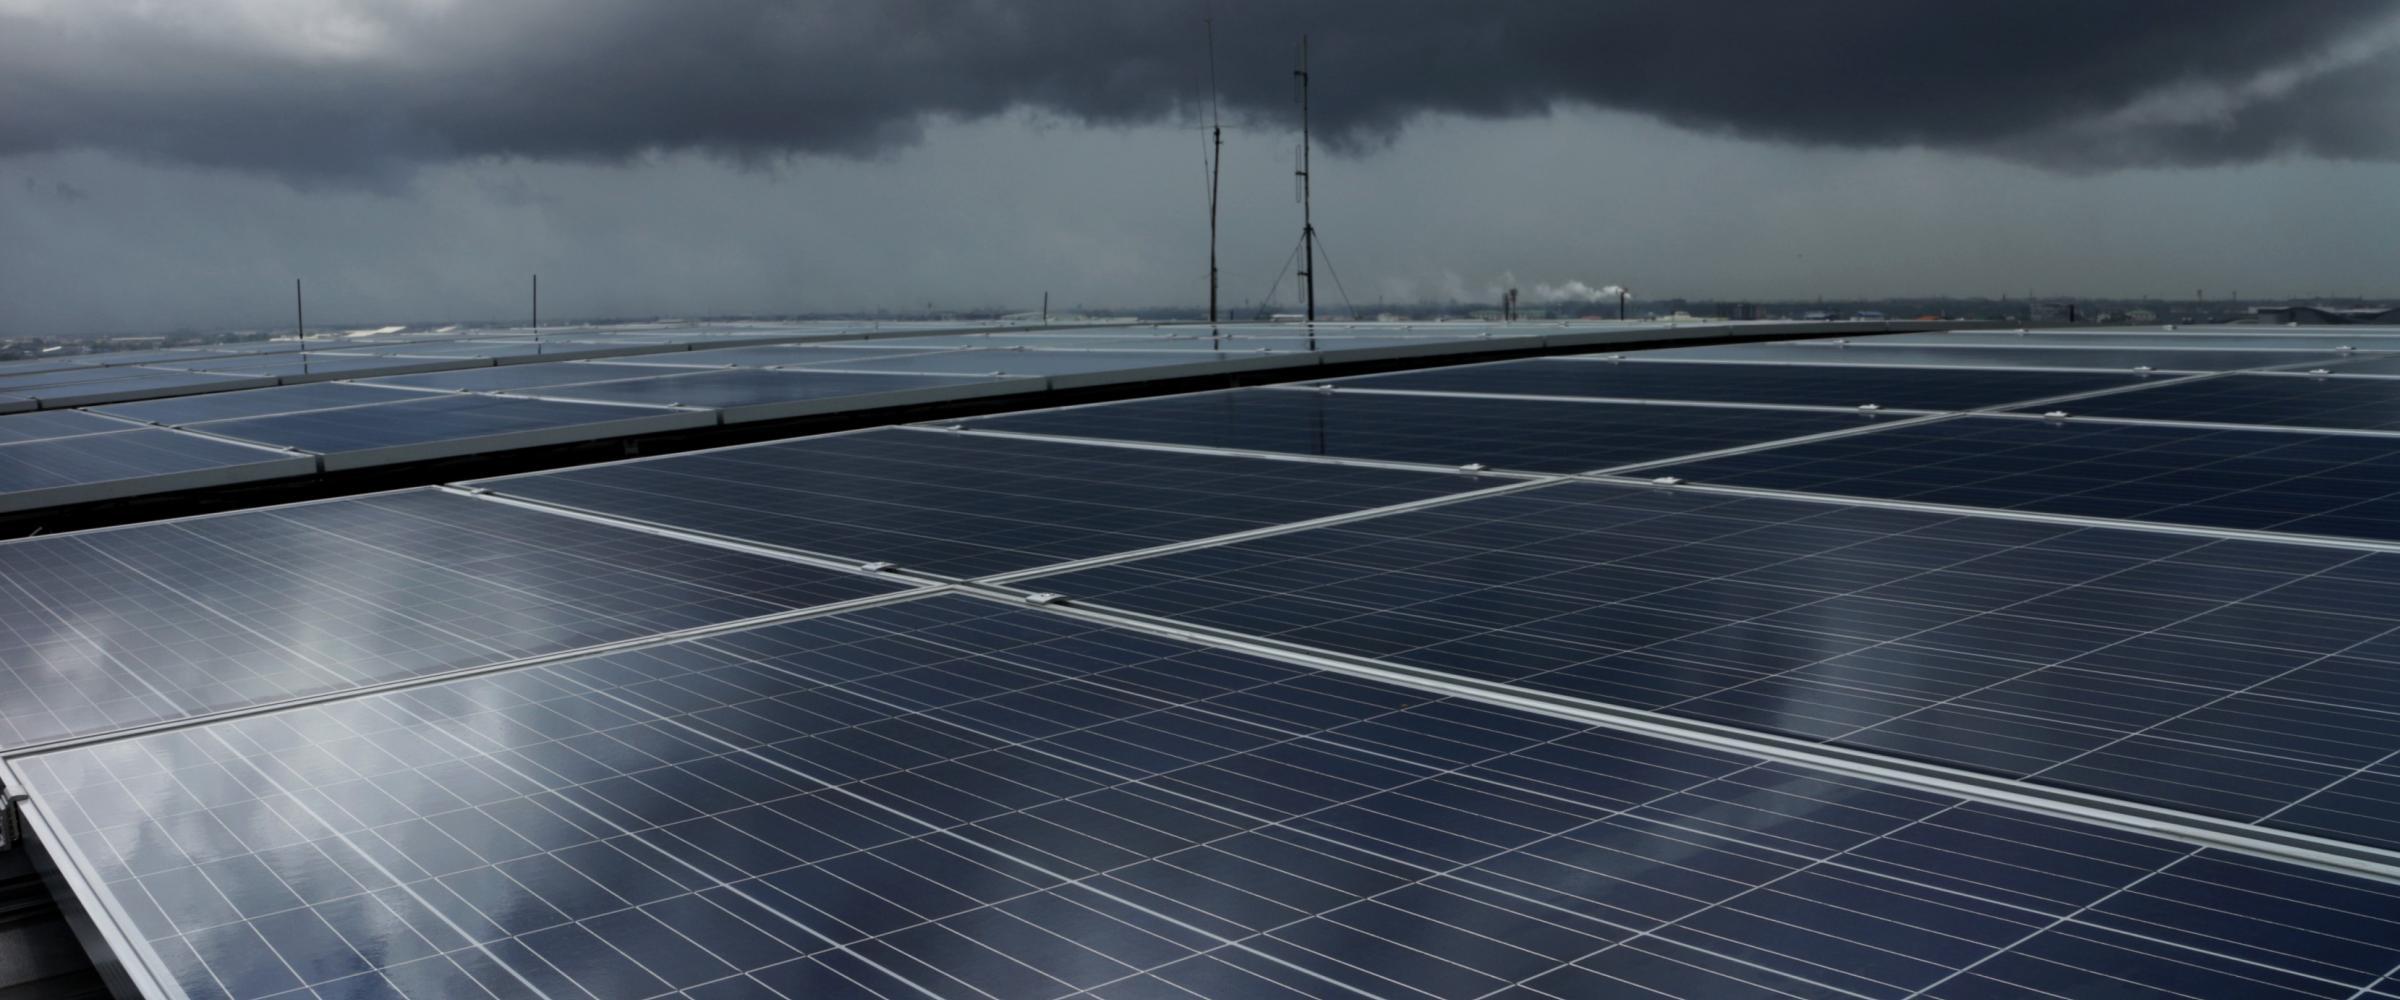 cloudy solar panels